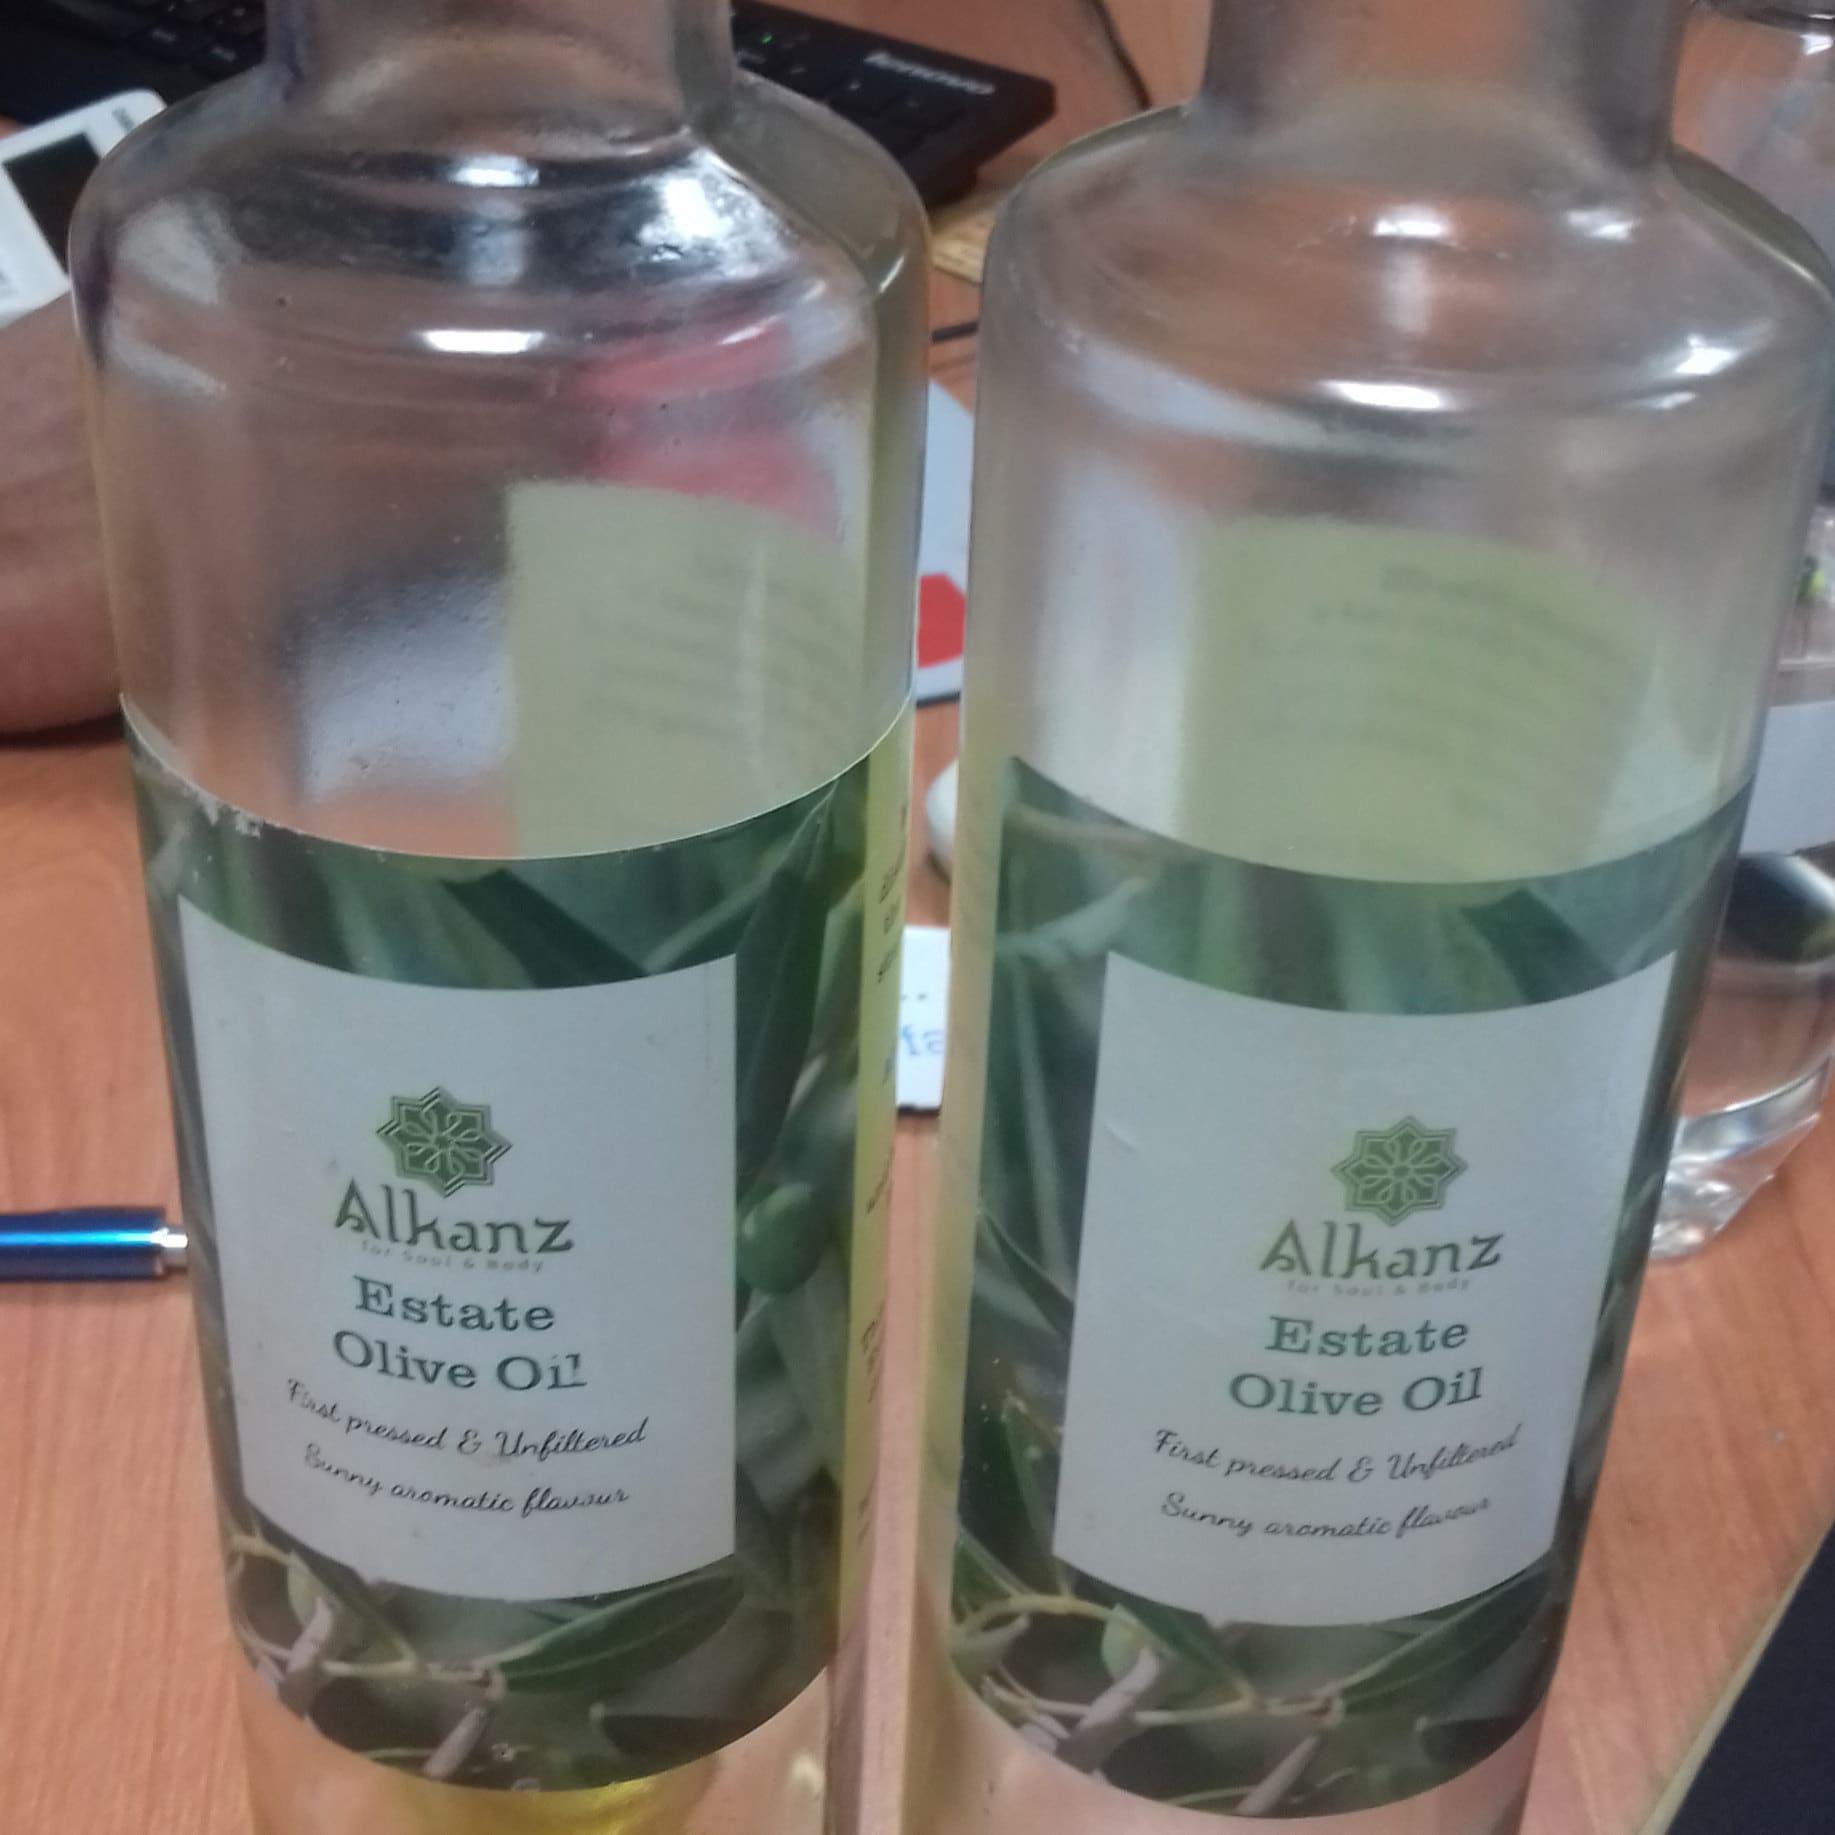 Rachelle Dasalla added a photo of their purchase